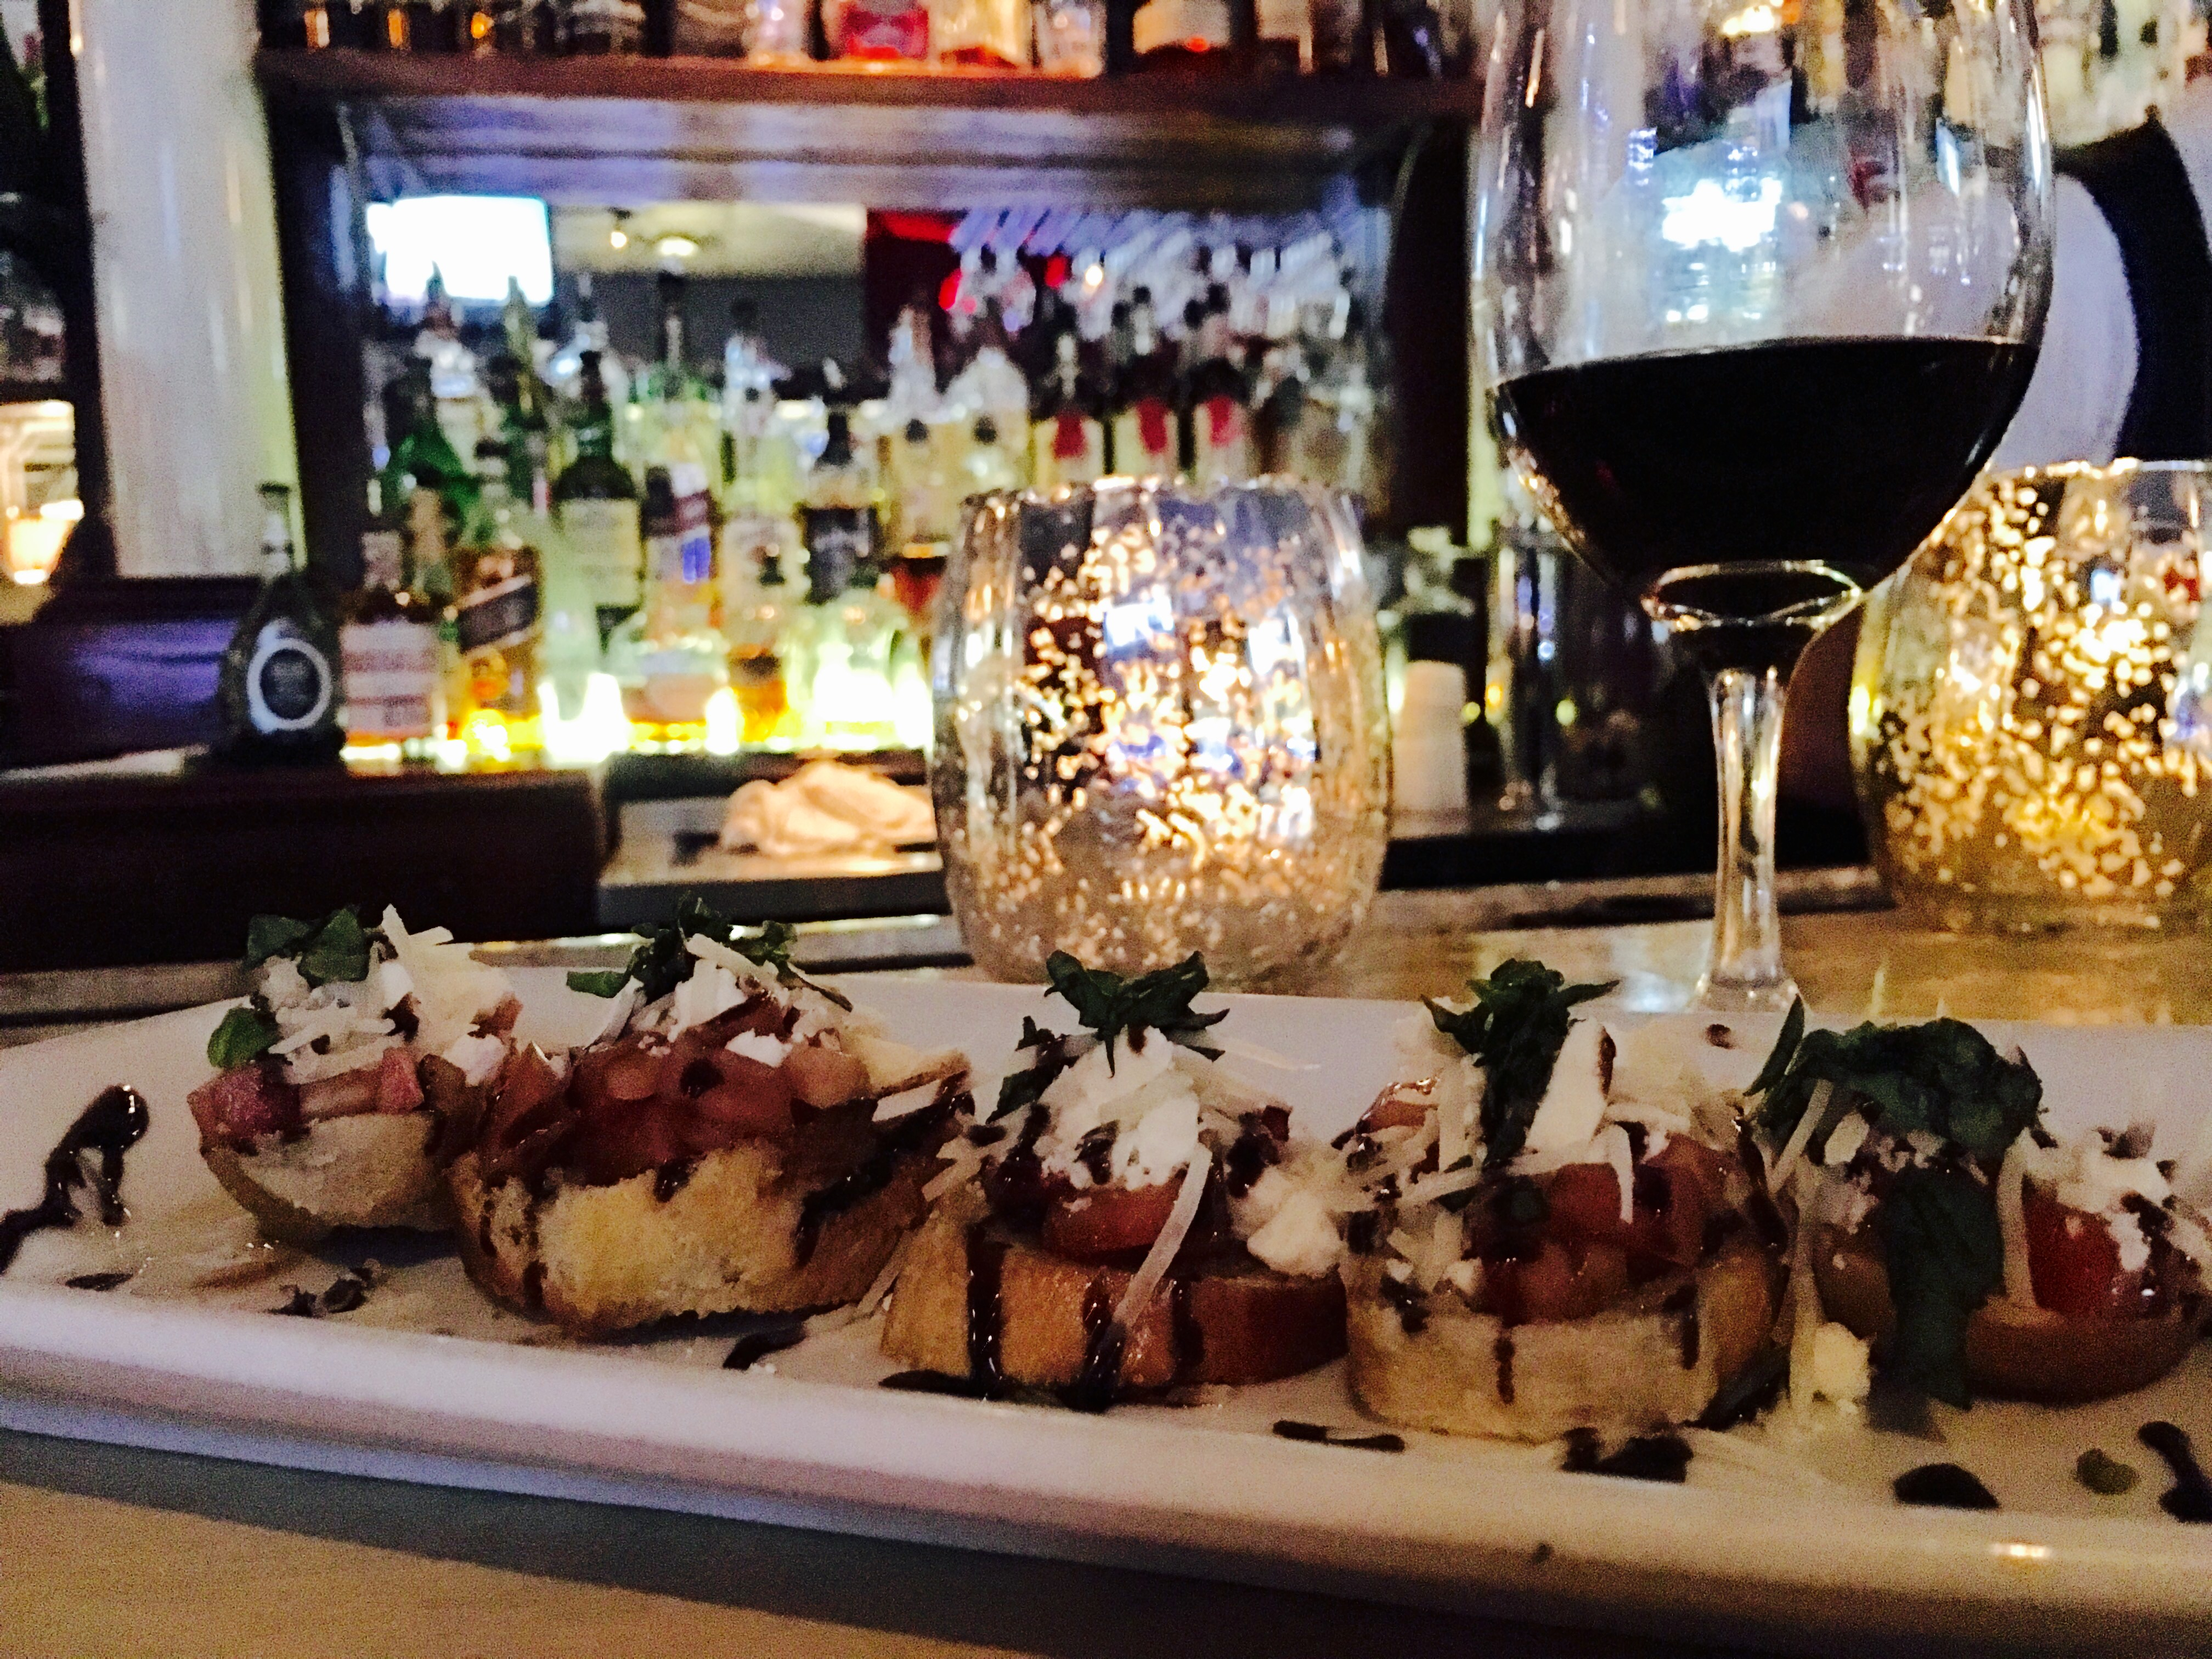 Bruschetta - Atop the Whimsical Bar of Oliviana's